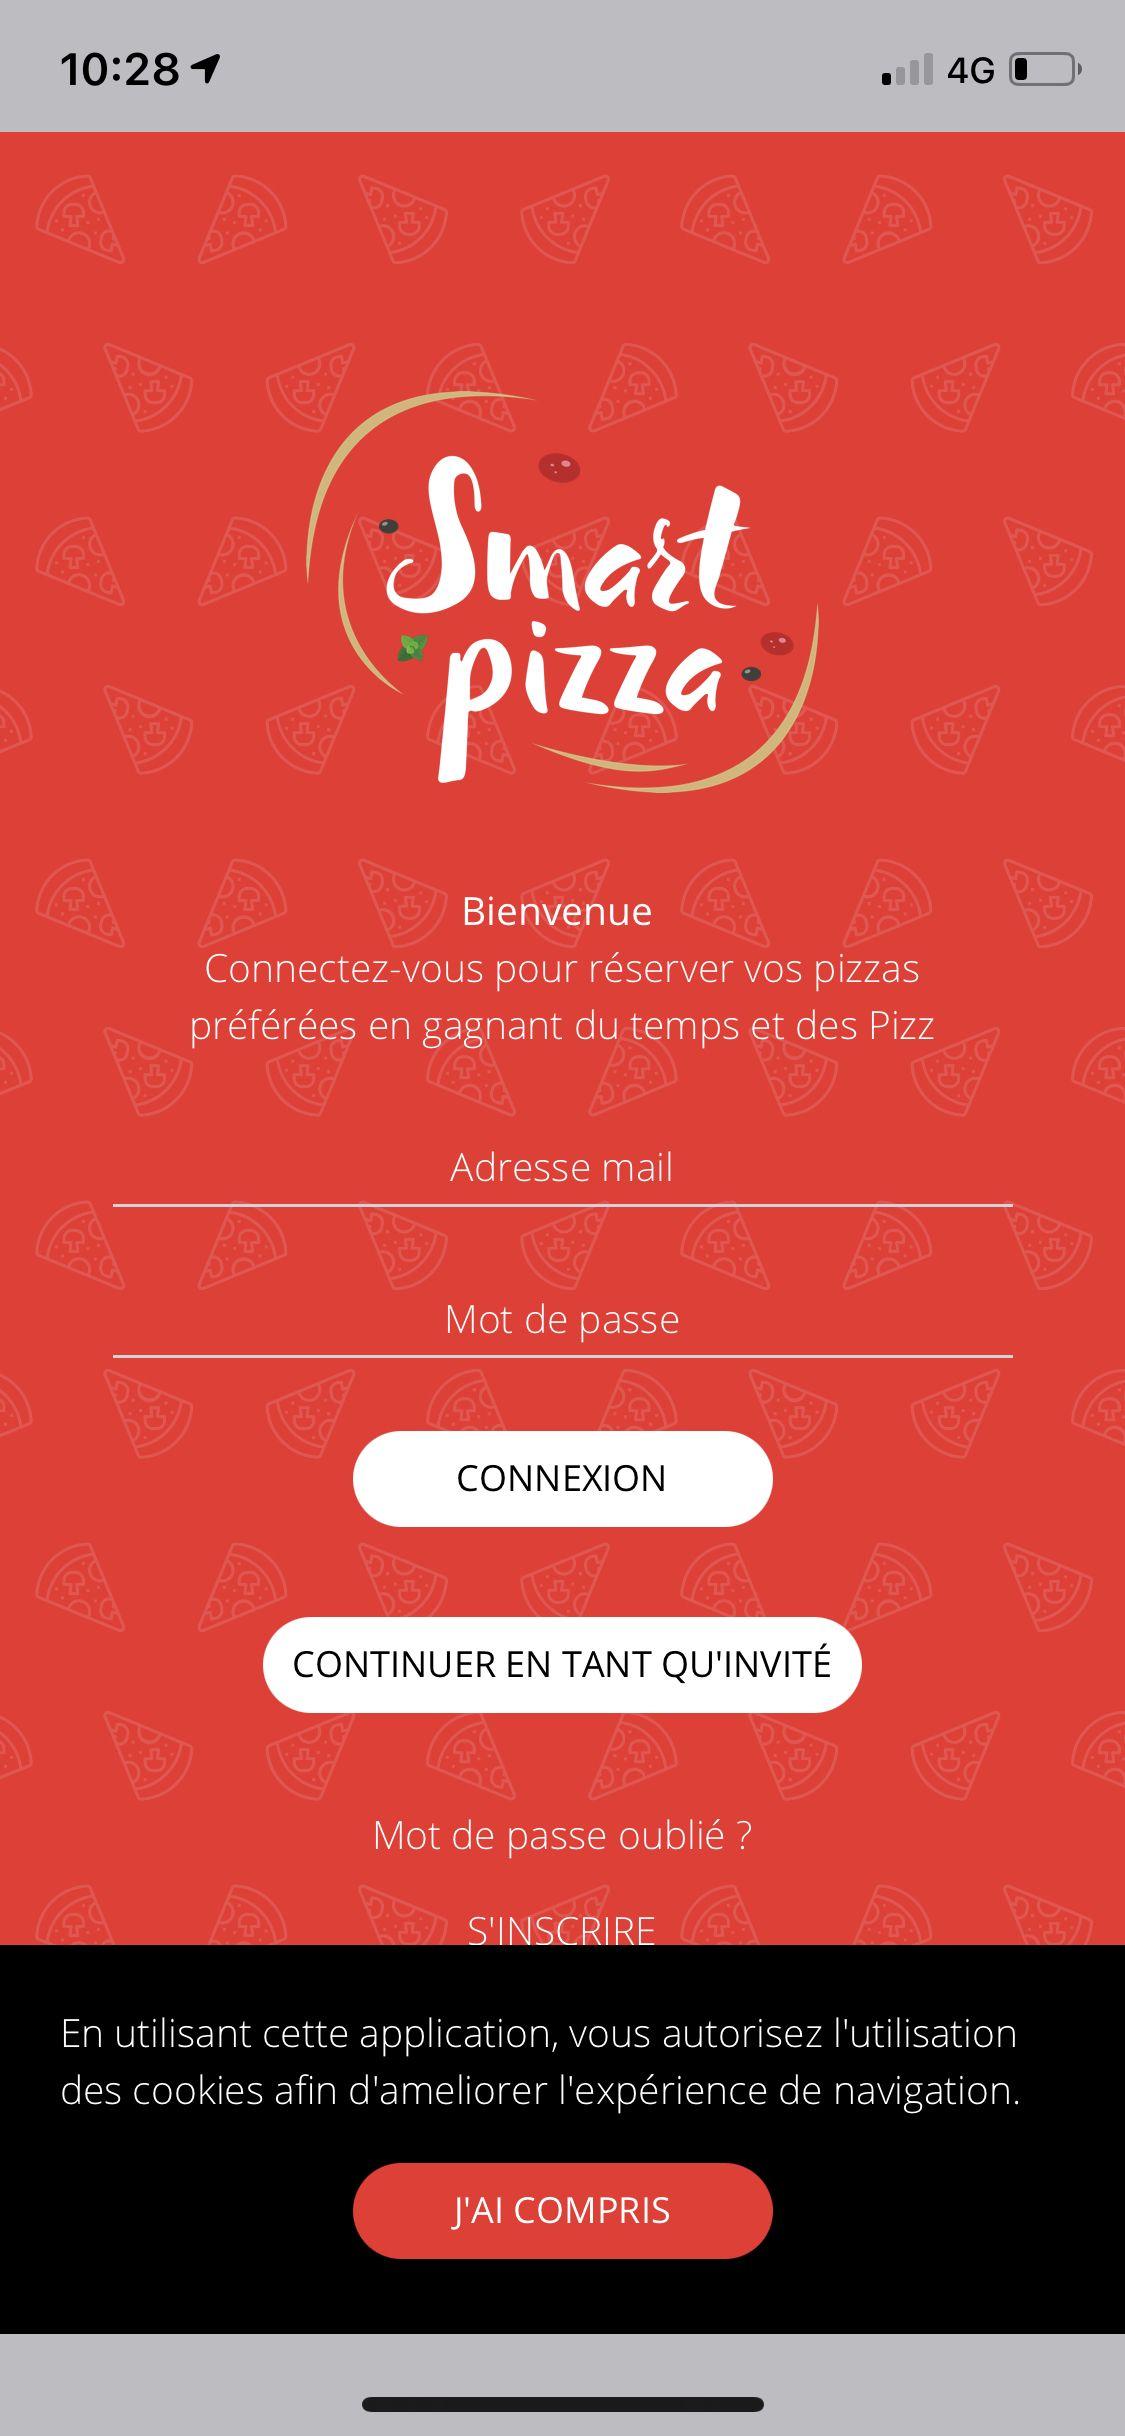 Application Smart Pizza